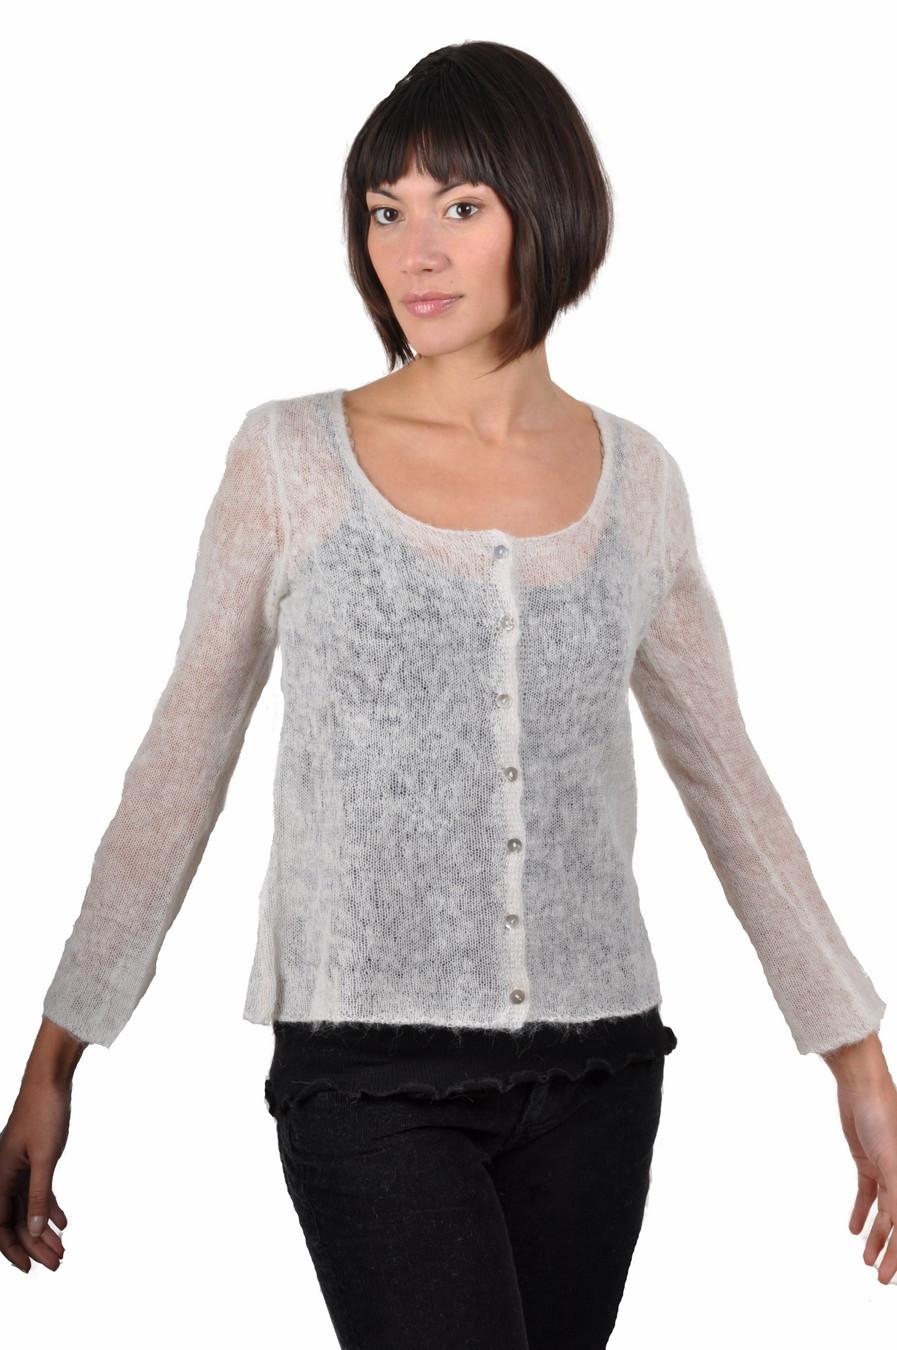 gilet col rond blanc mohair, laine, nylon (femme)